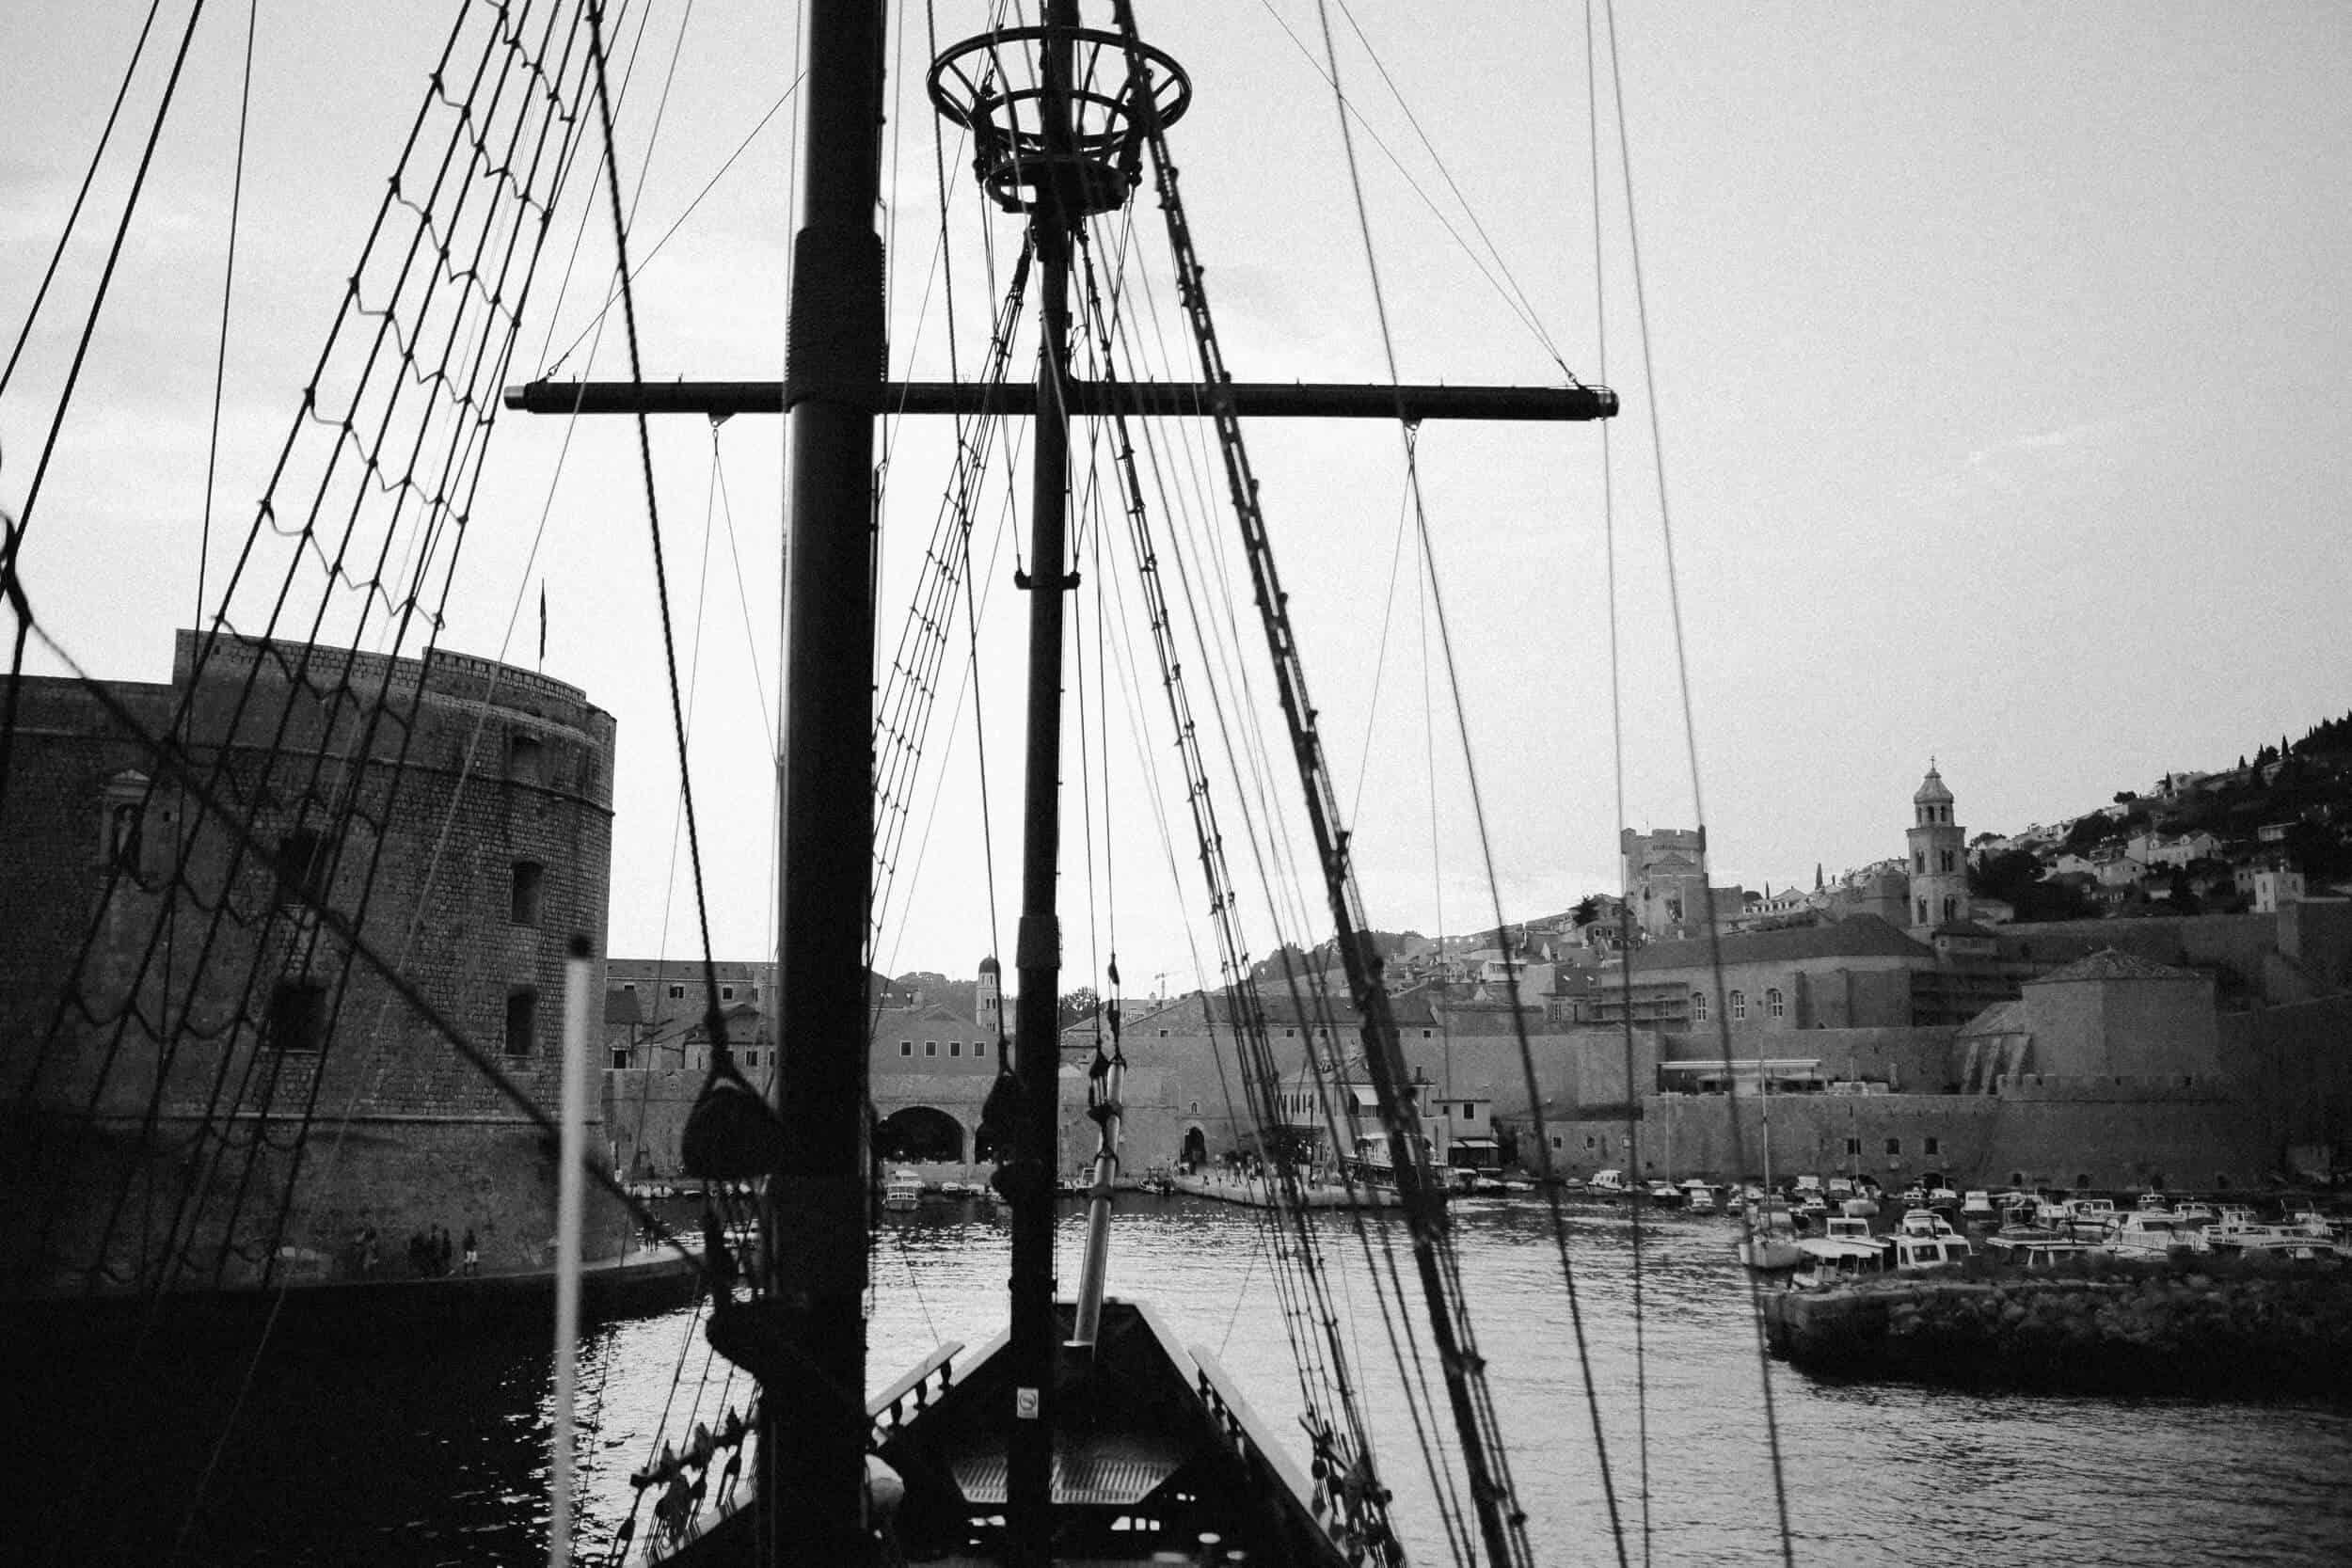 Dubrovnik karaka boat elopement matea stephan 18 | Croatia Elopement Photographer and Videographer